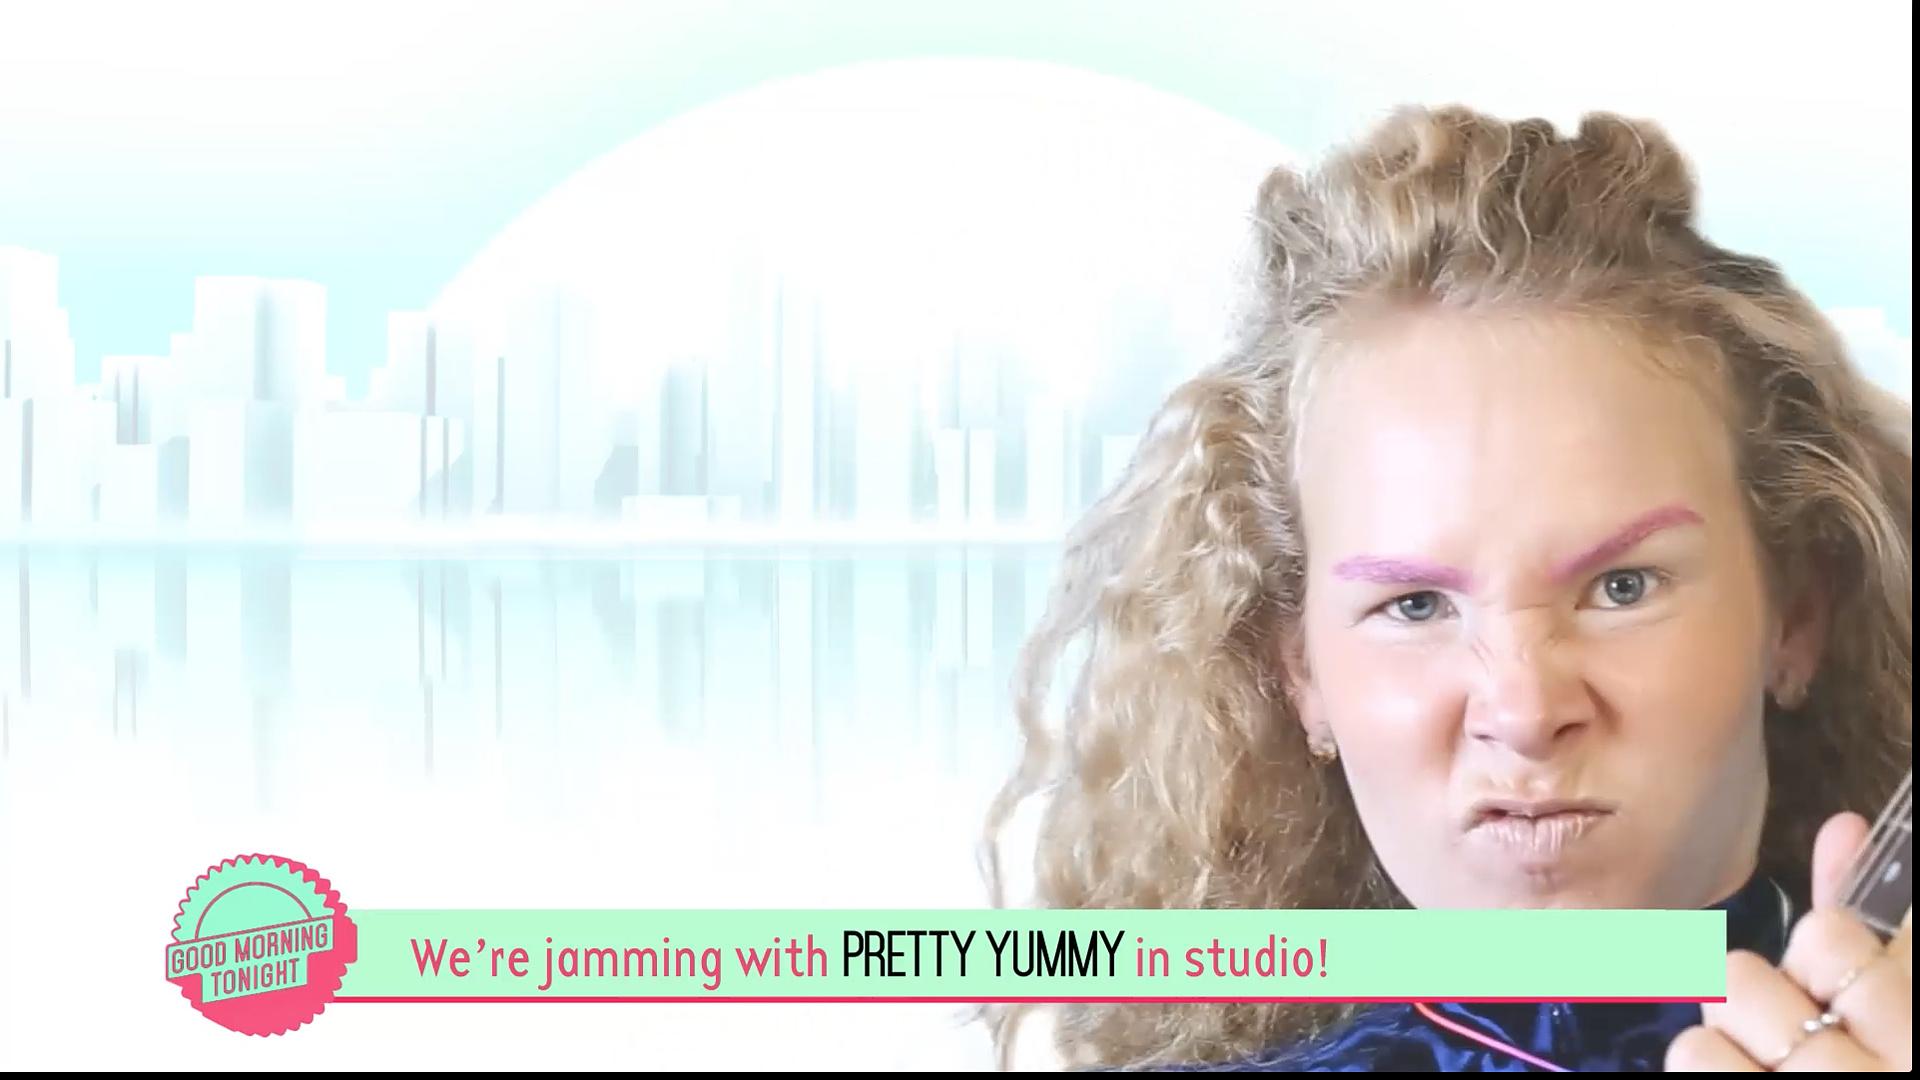 Pretty Yummy Jams with us in Studio!